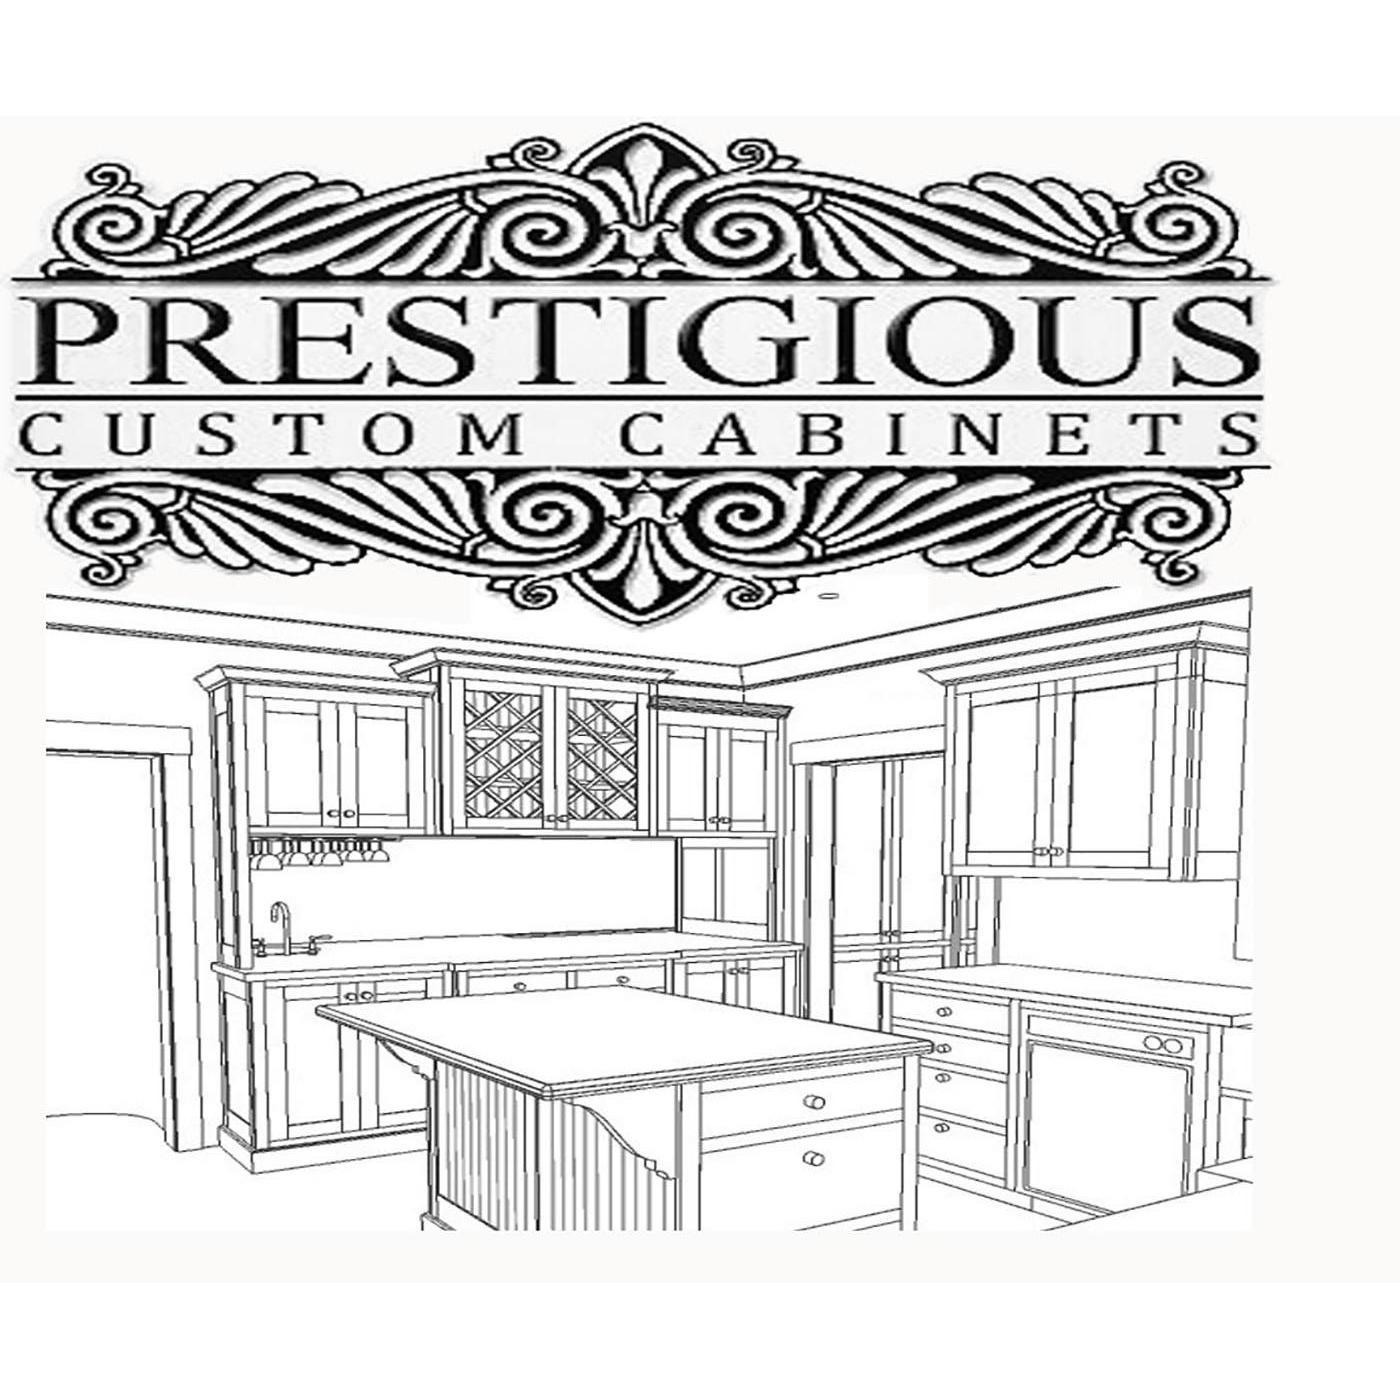 Prestigious Custom Cabinets LLC